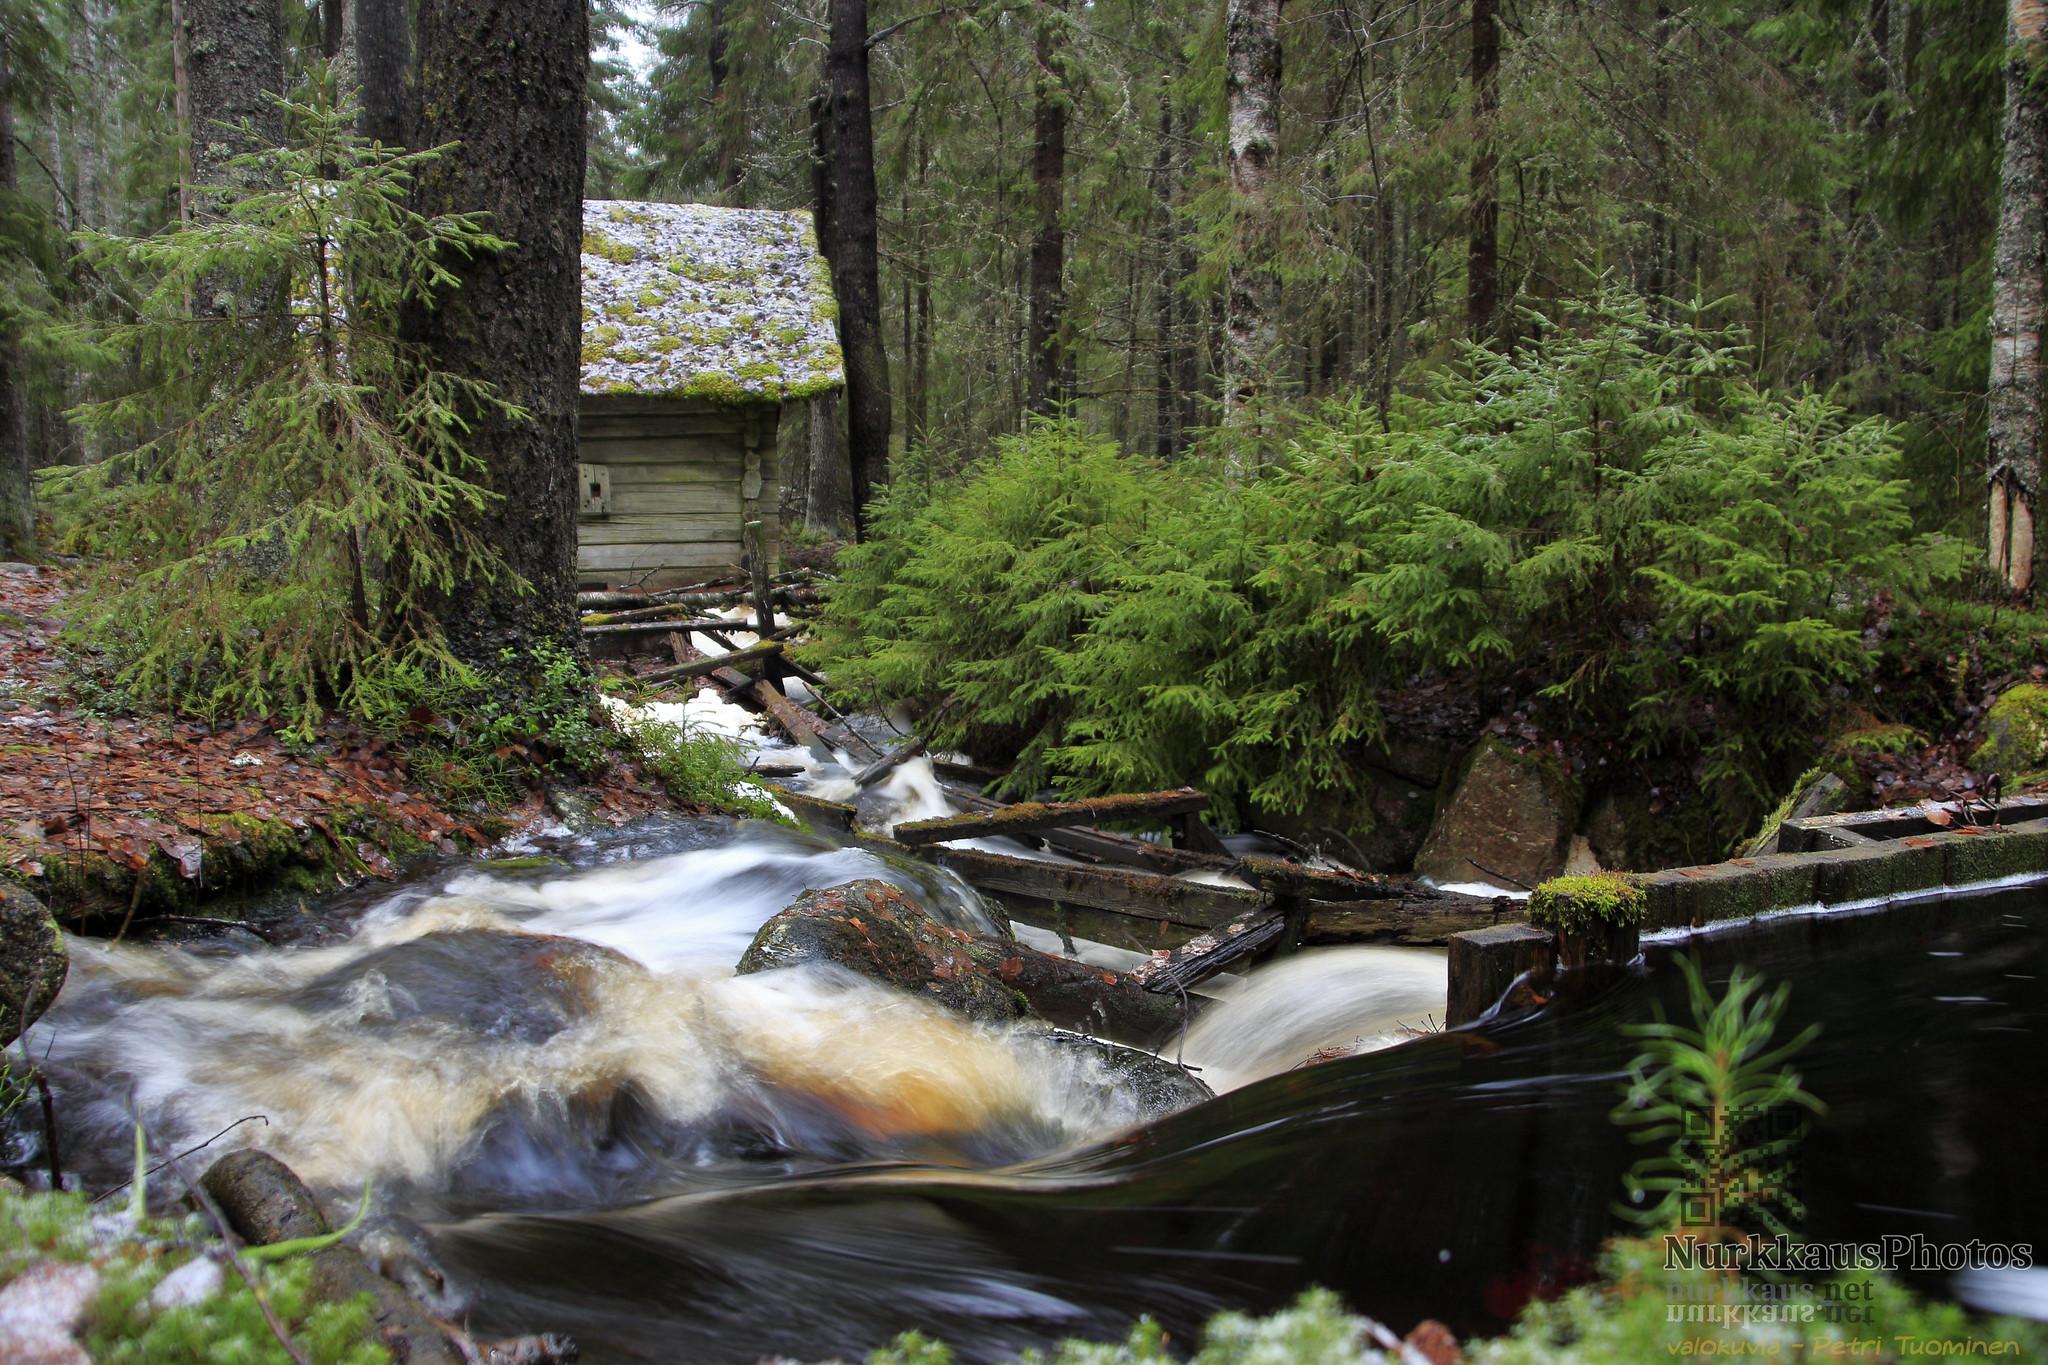 Old mill at Liesijoki